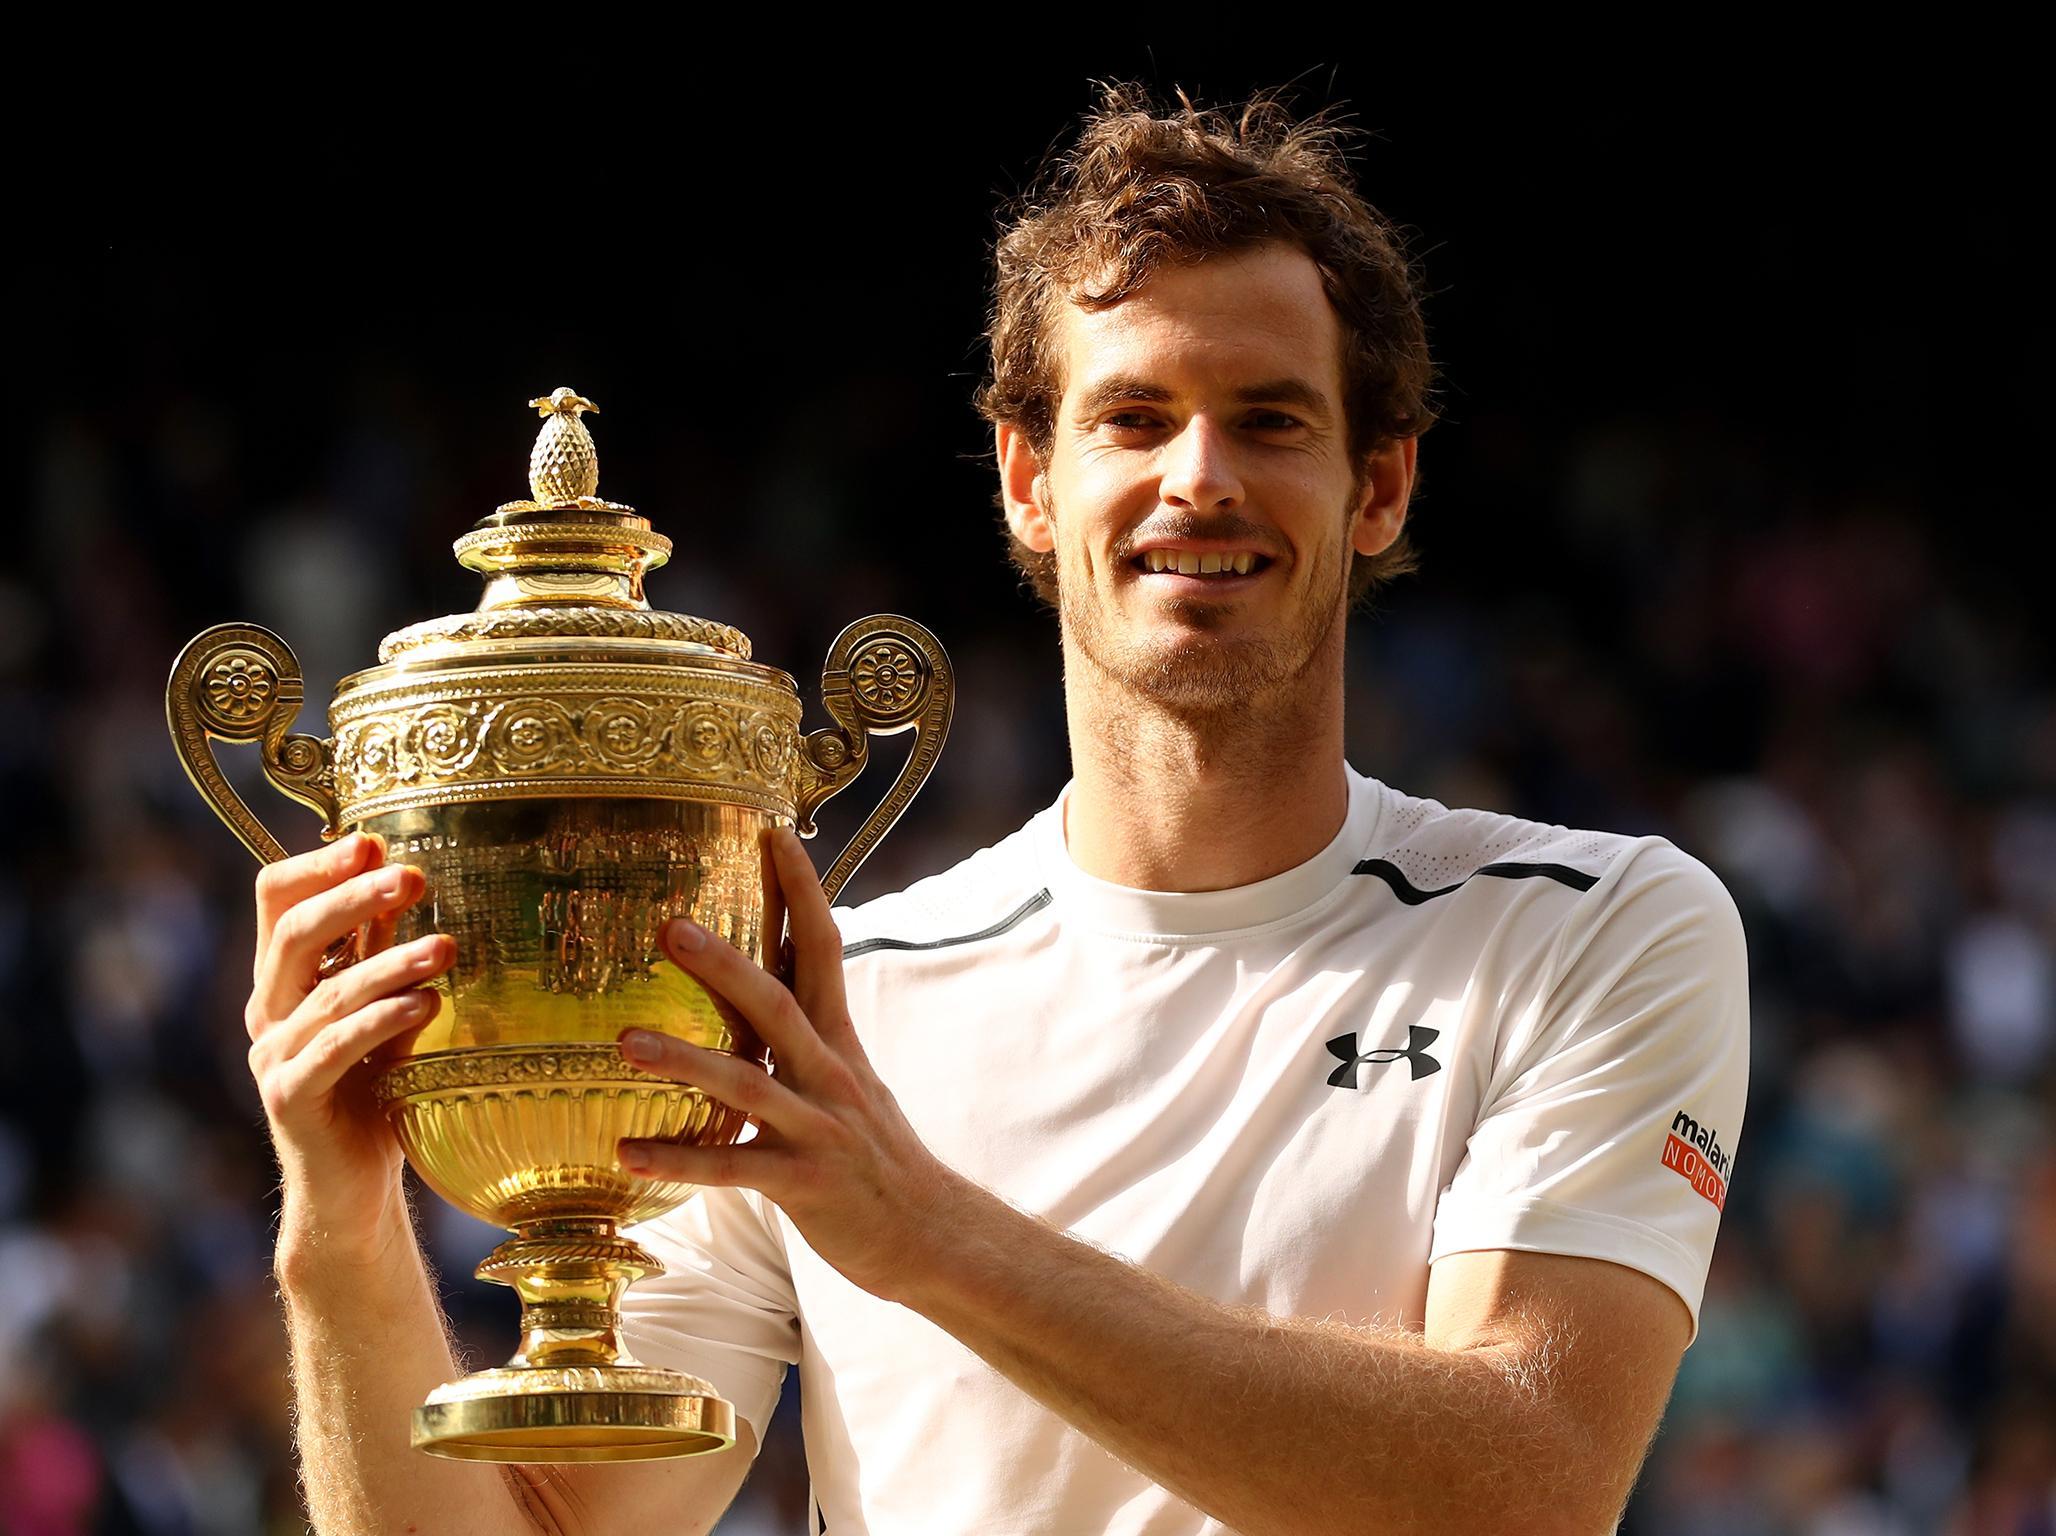 Andy Murray's Wimbledon appearances